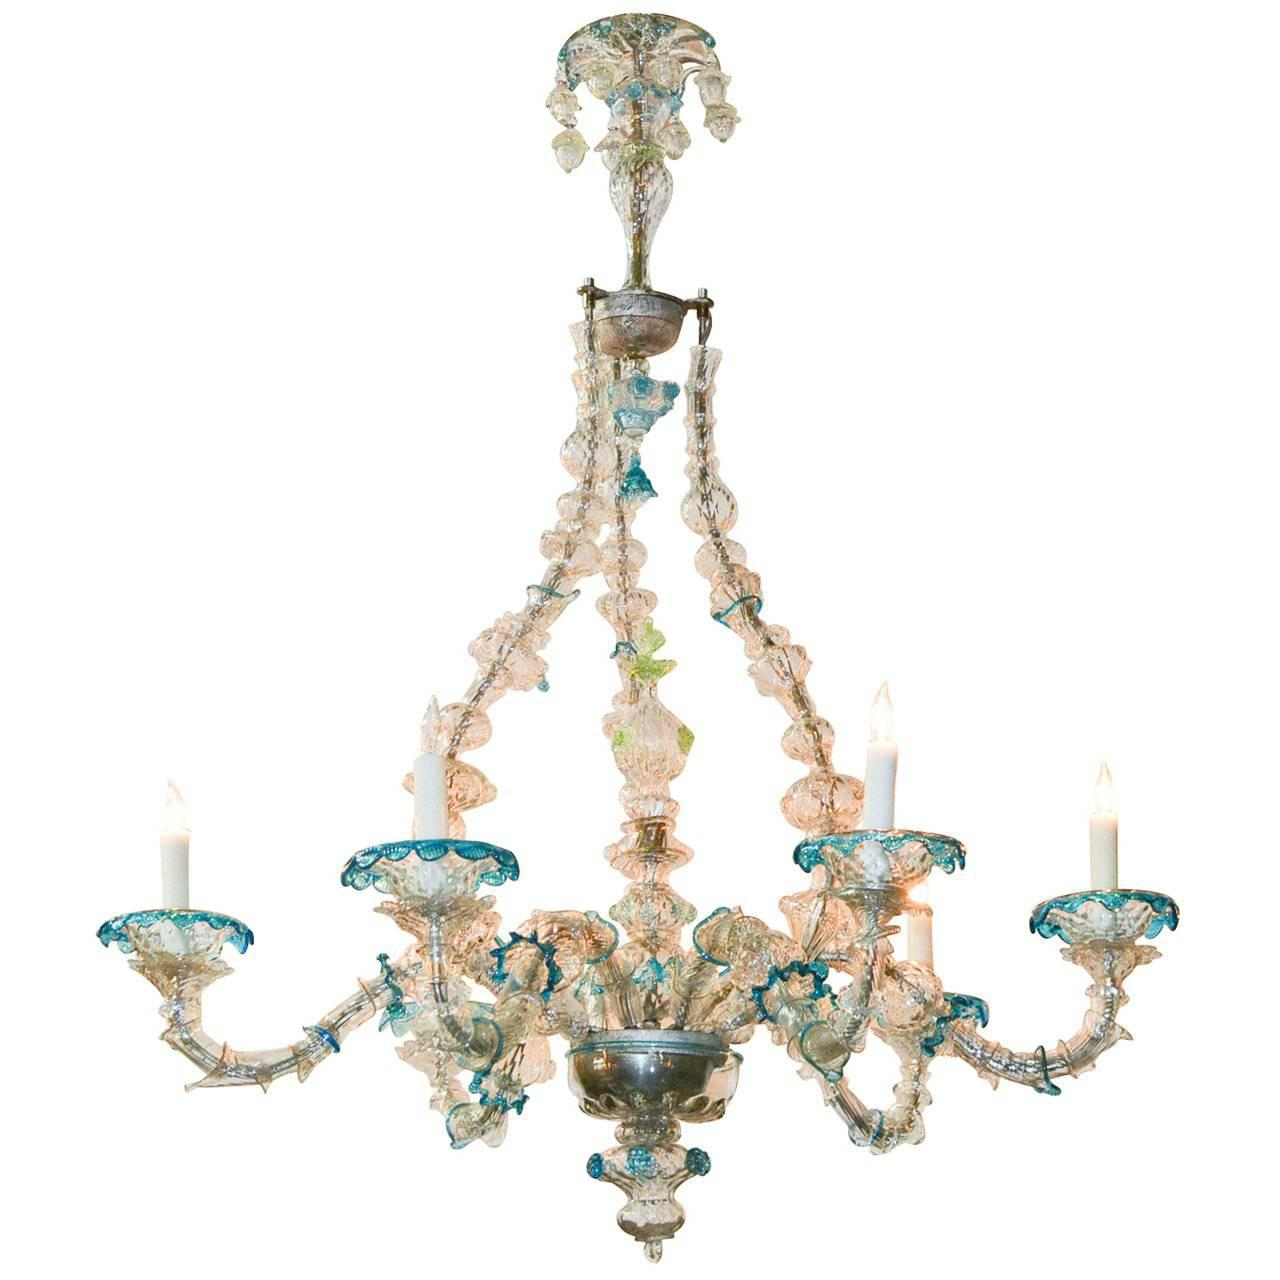 Rare and Unusual Venetian Glass Chandelier